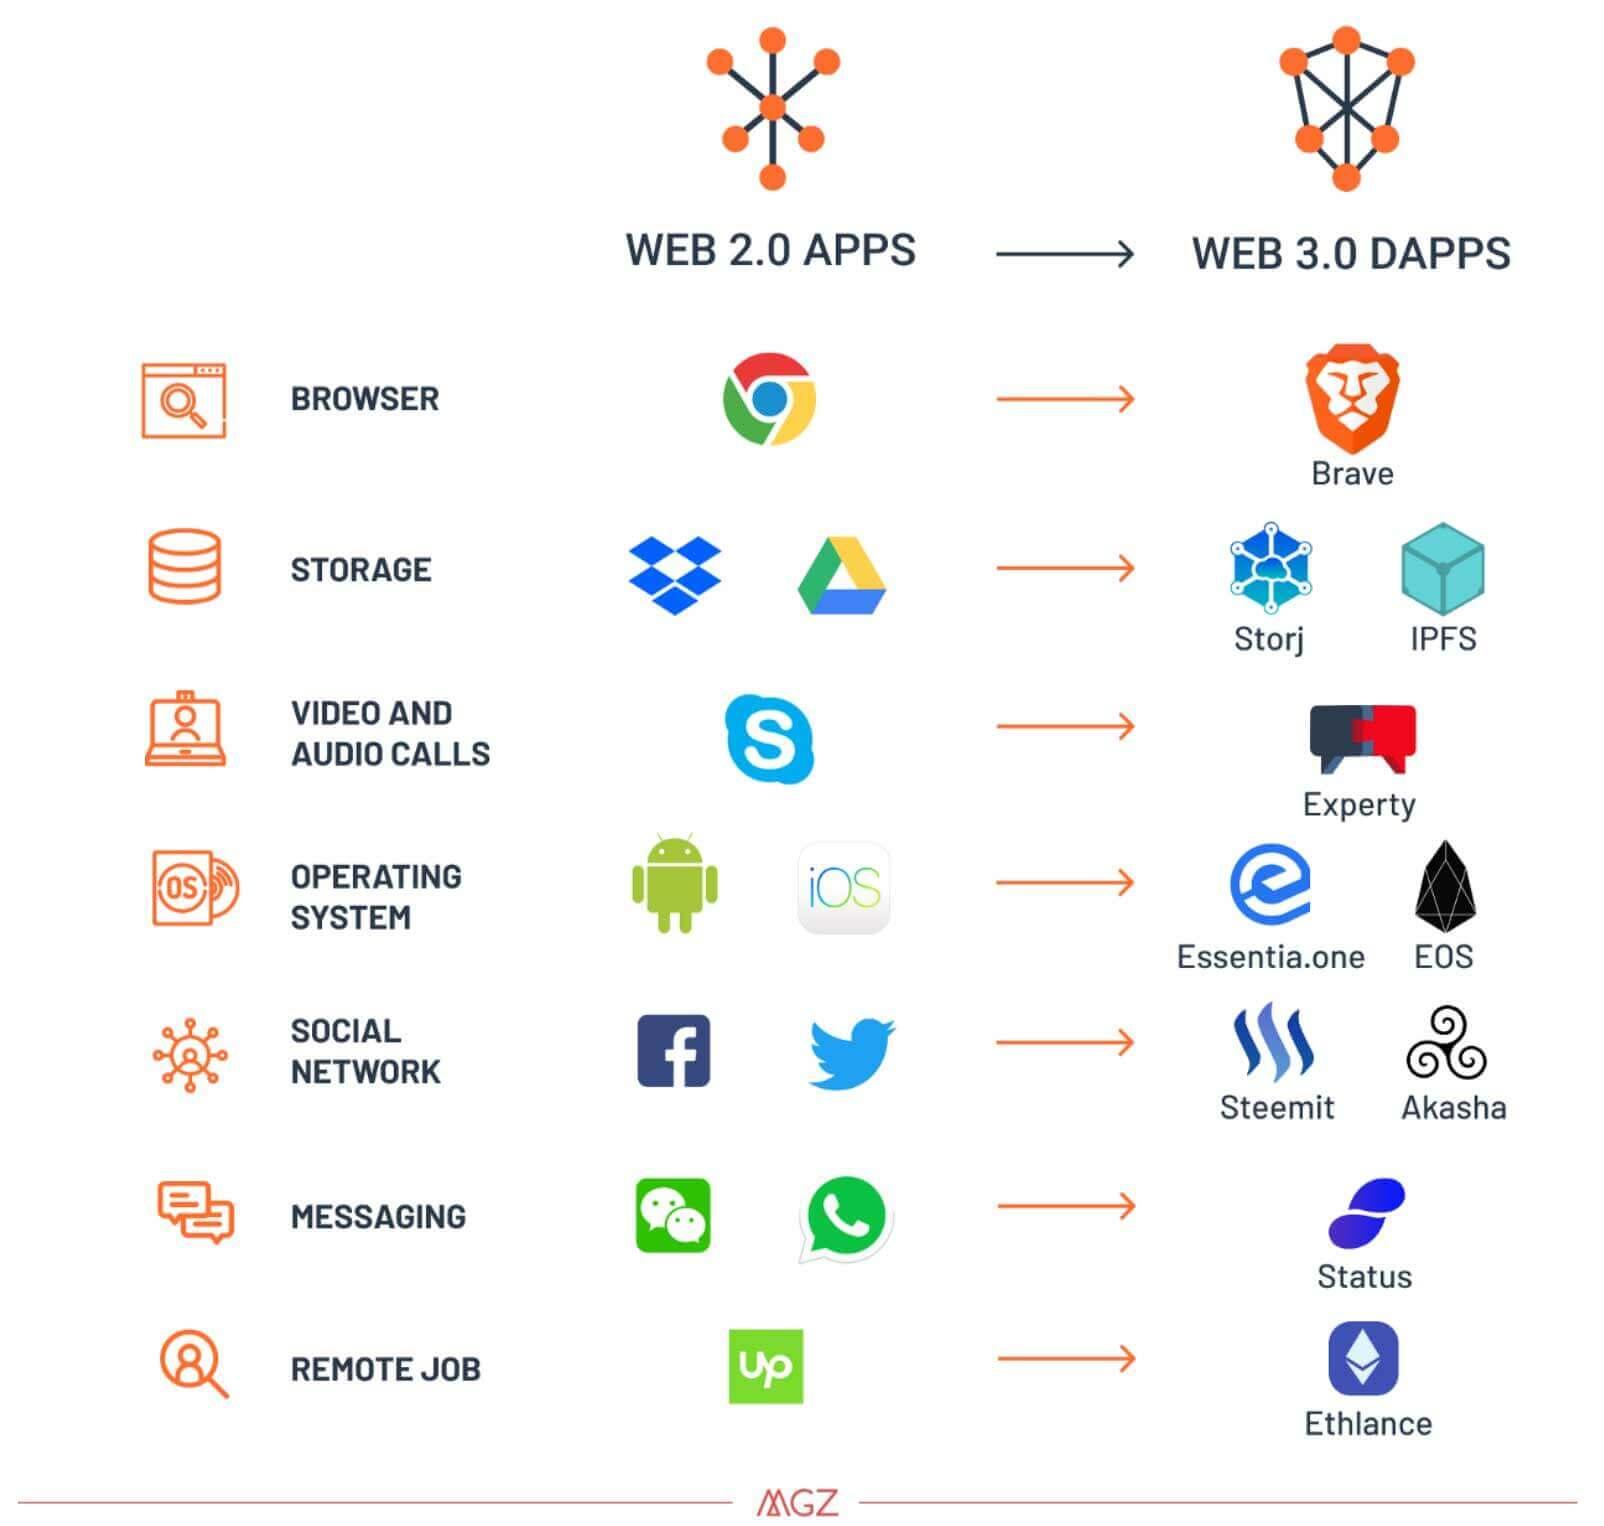 Web 3.0 انترنت الجيل الثالث